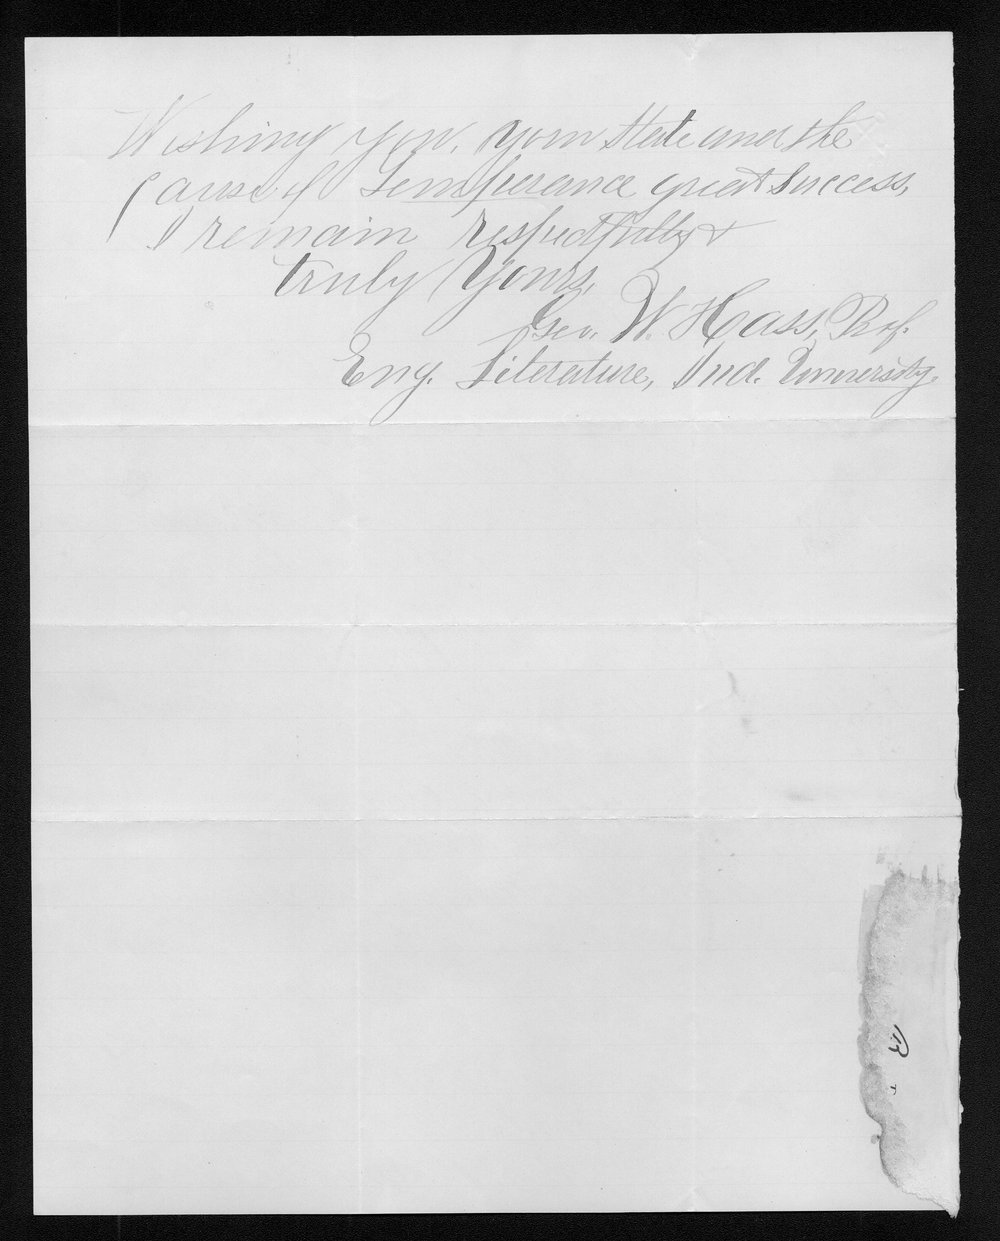 Governor John St. John prohibition received correspondence - 6